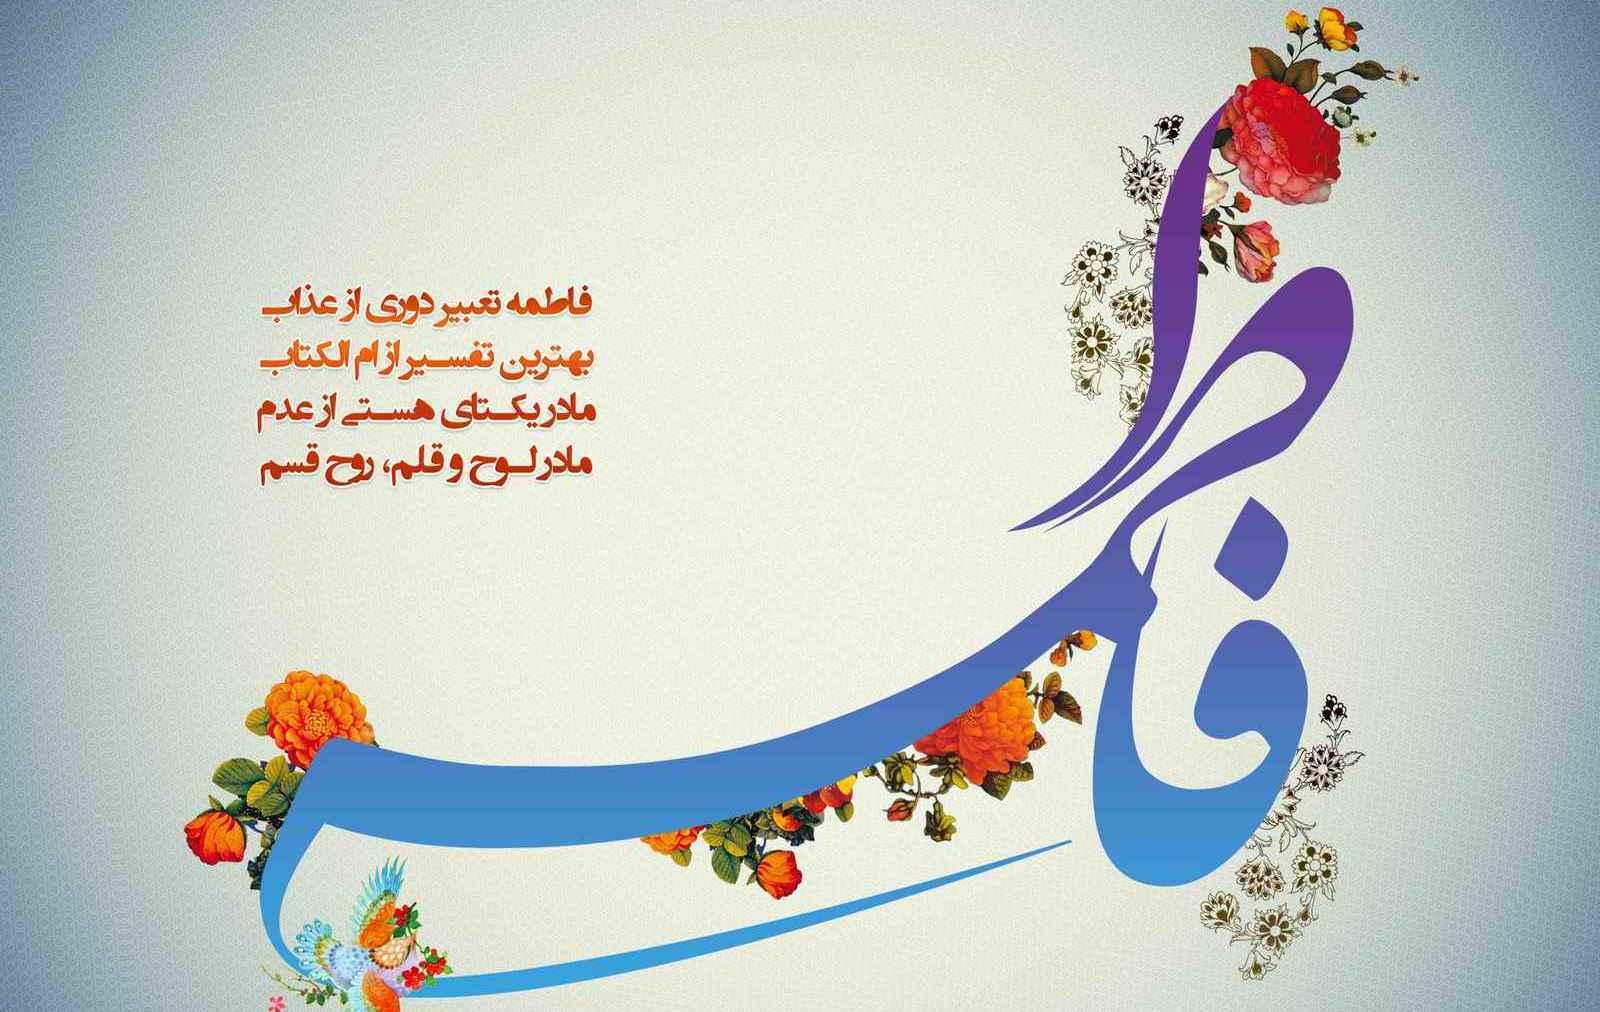 میلاد حضرت زهرا / جواد مقدم